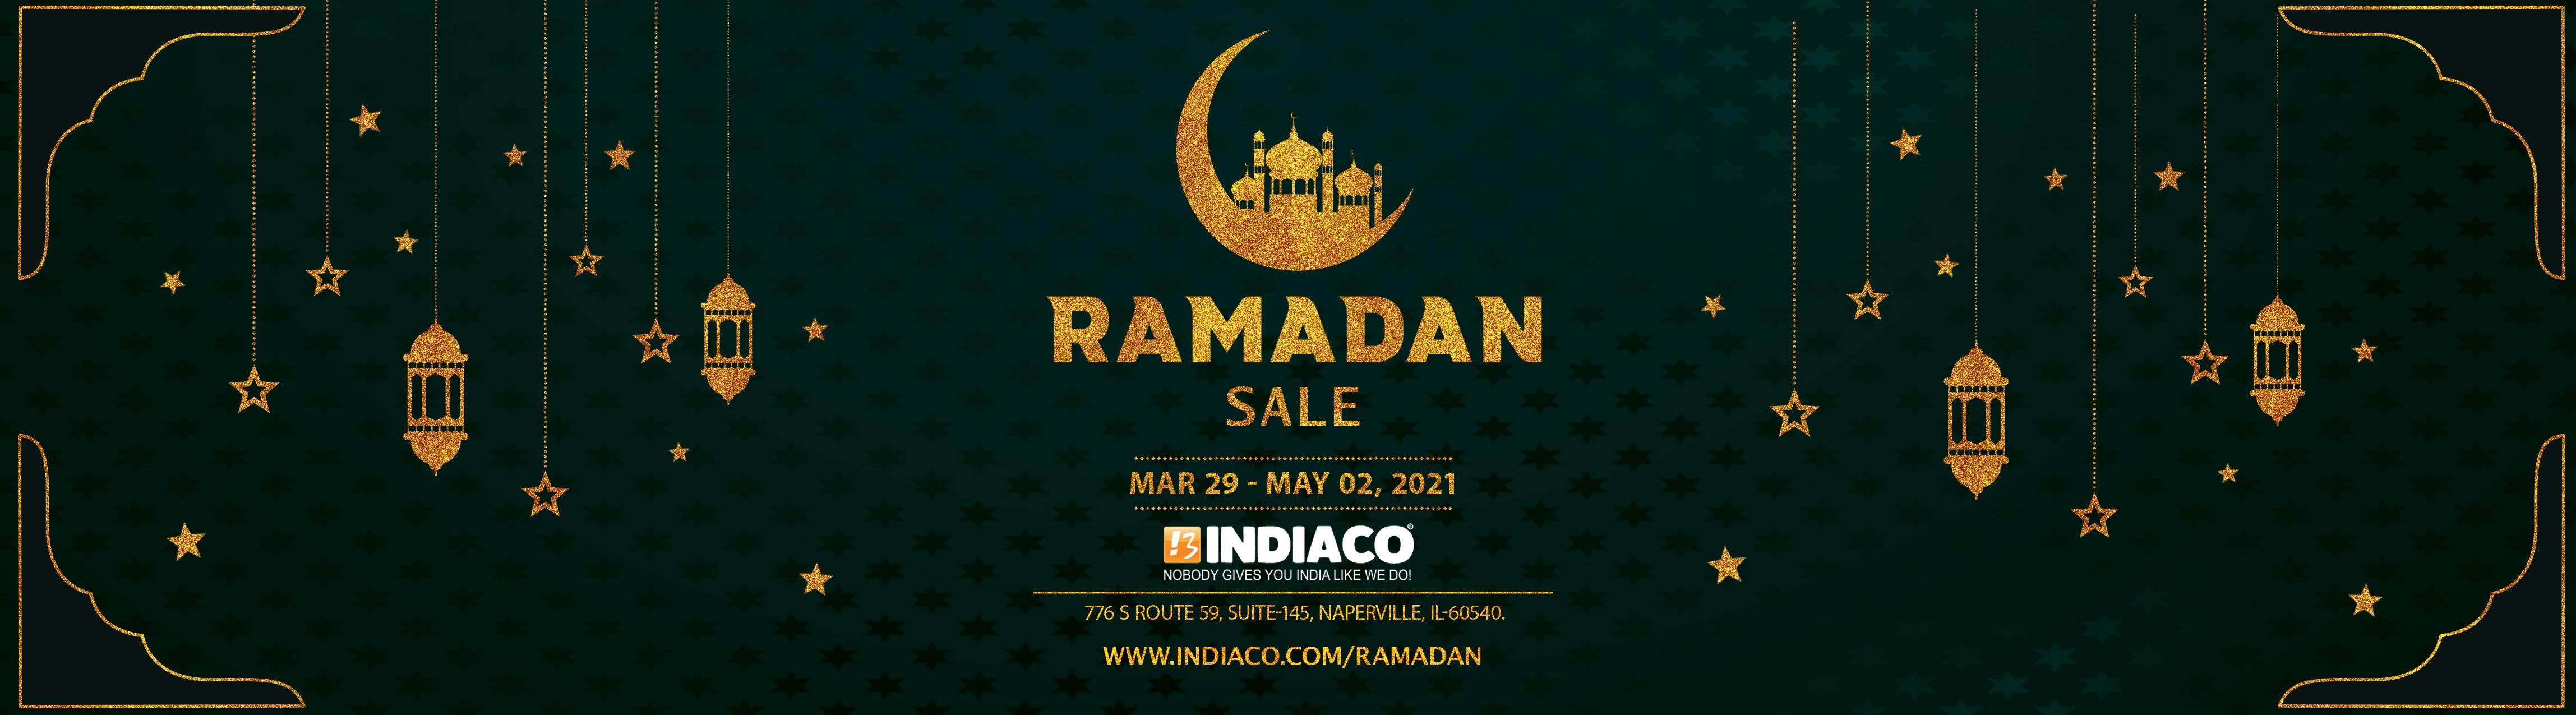 Ramadan-Flyer-cover-web-1